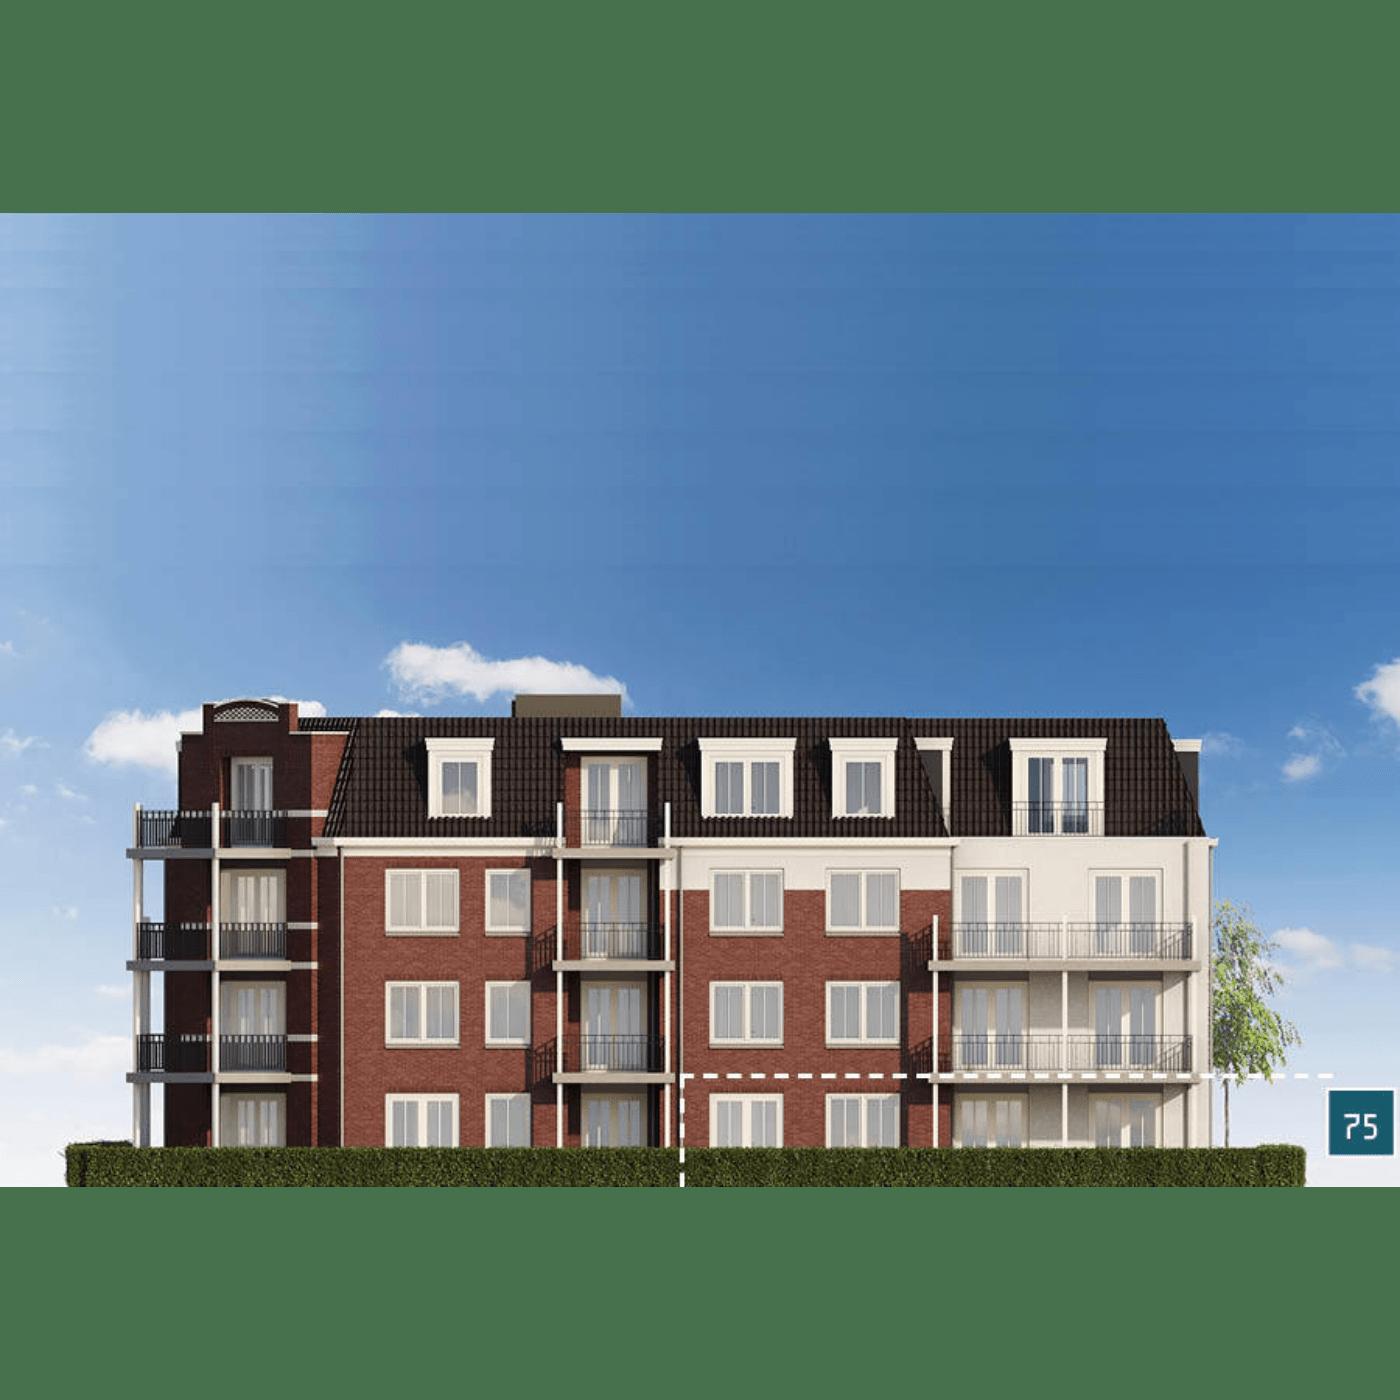 Huisdetail Appartementen 75